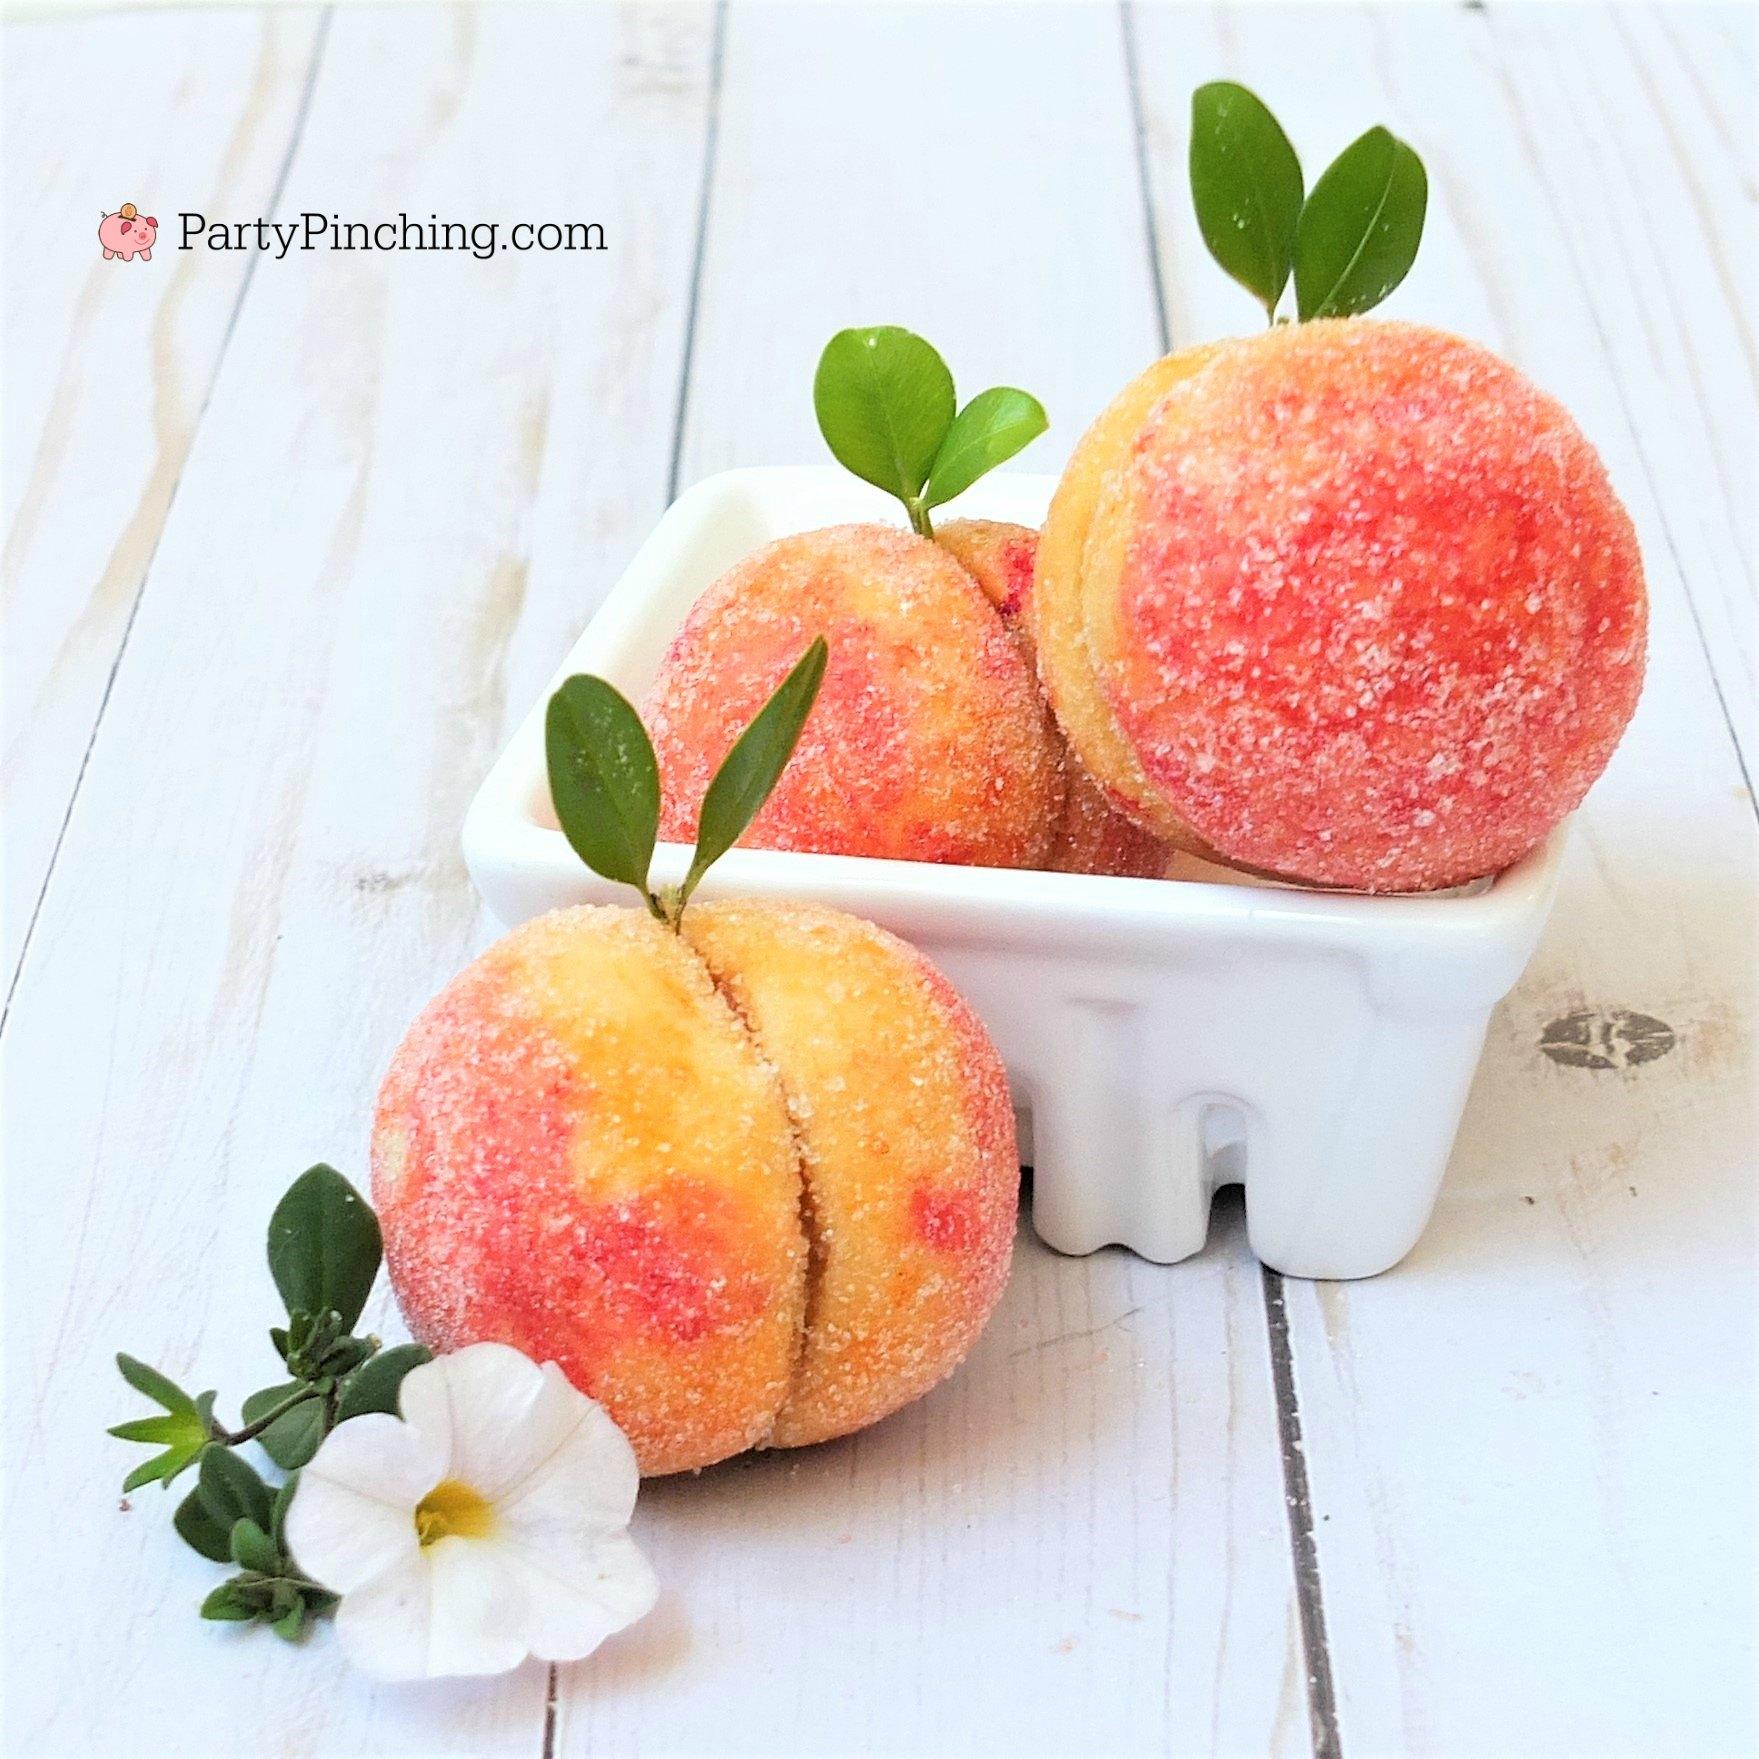 peach cookies, cute summer cookies, Georgia peach cookies, Russian peach cookies, peach sugar cookies, cookies look like peaches, summer dessert picnic potluck food ideas